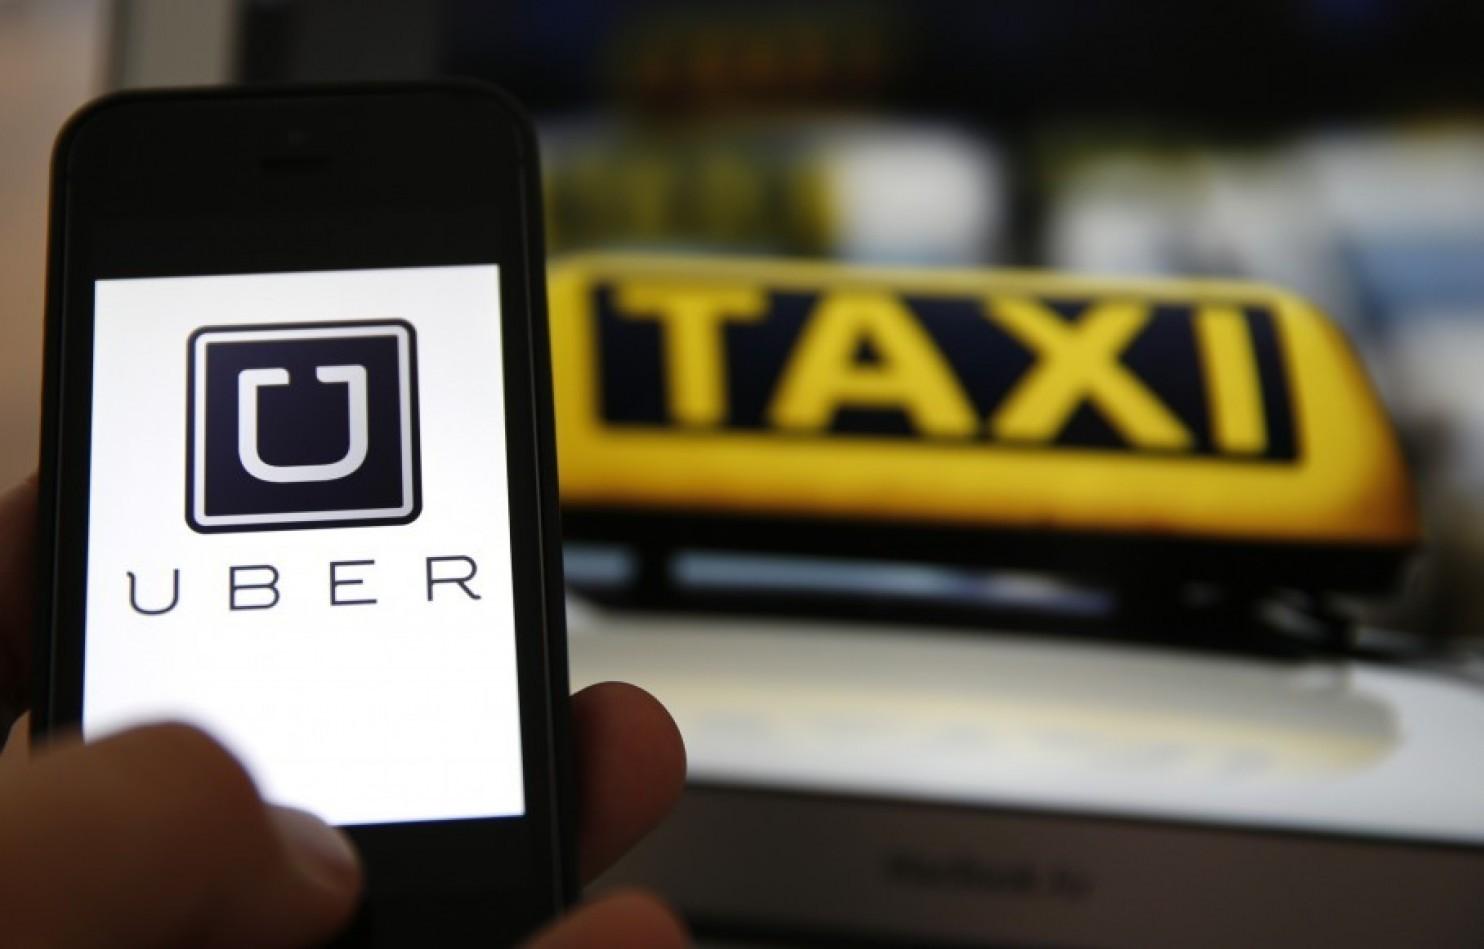 Uber заявила об уходе из Дании из-за конфликта с властями